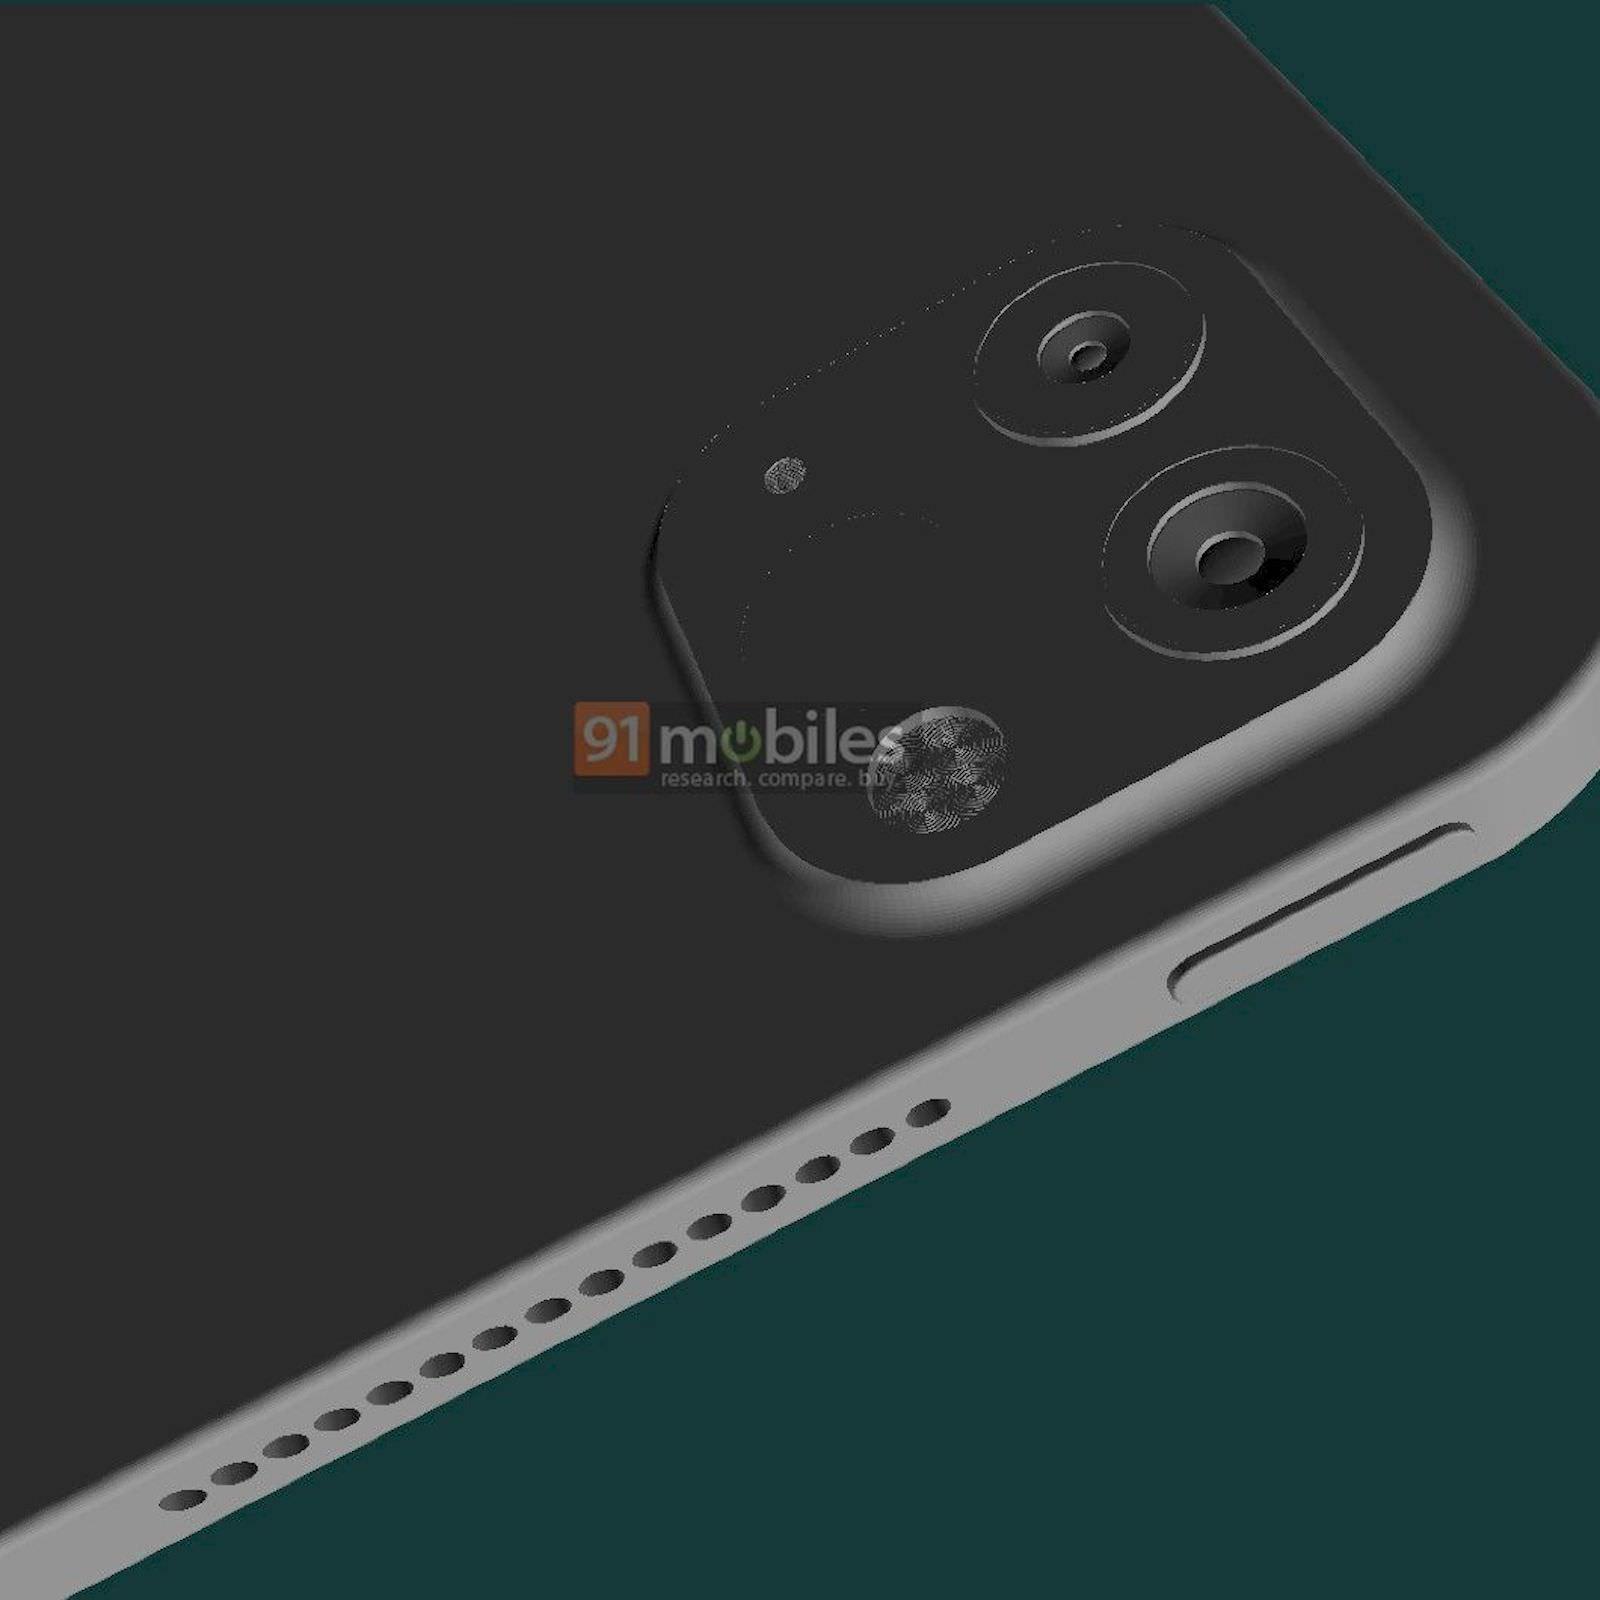 iPad-Pro-2021-Cad-renders-09.jpg